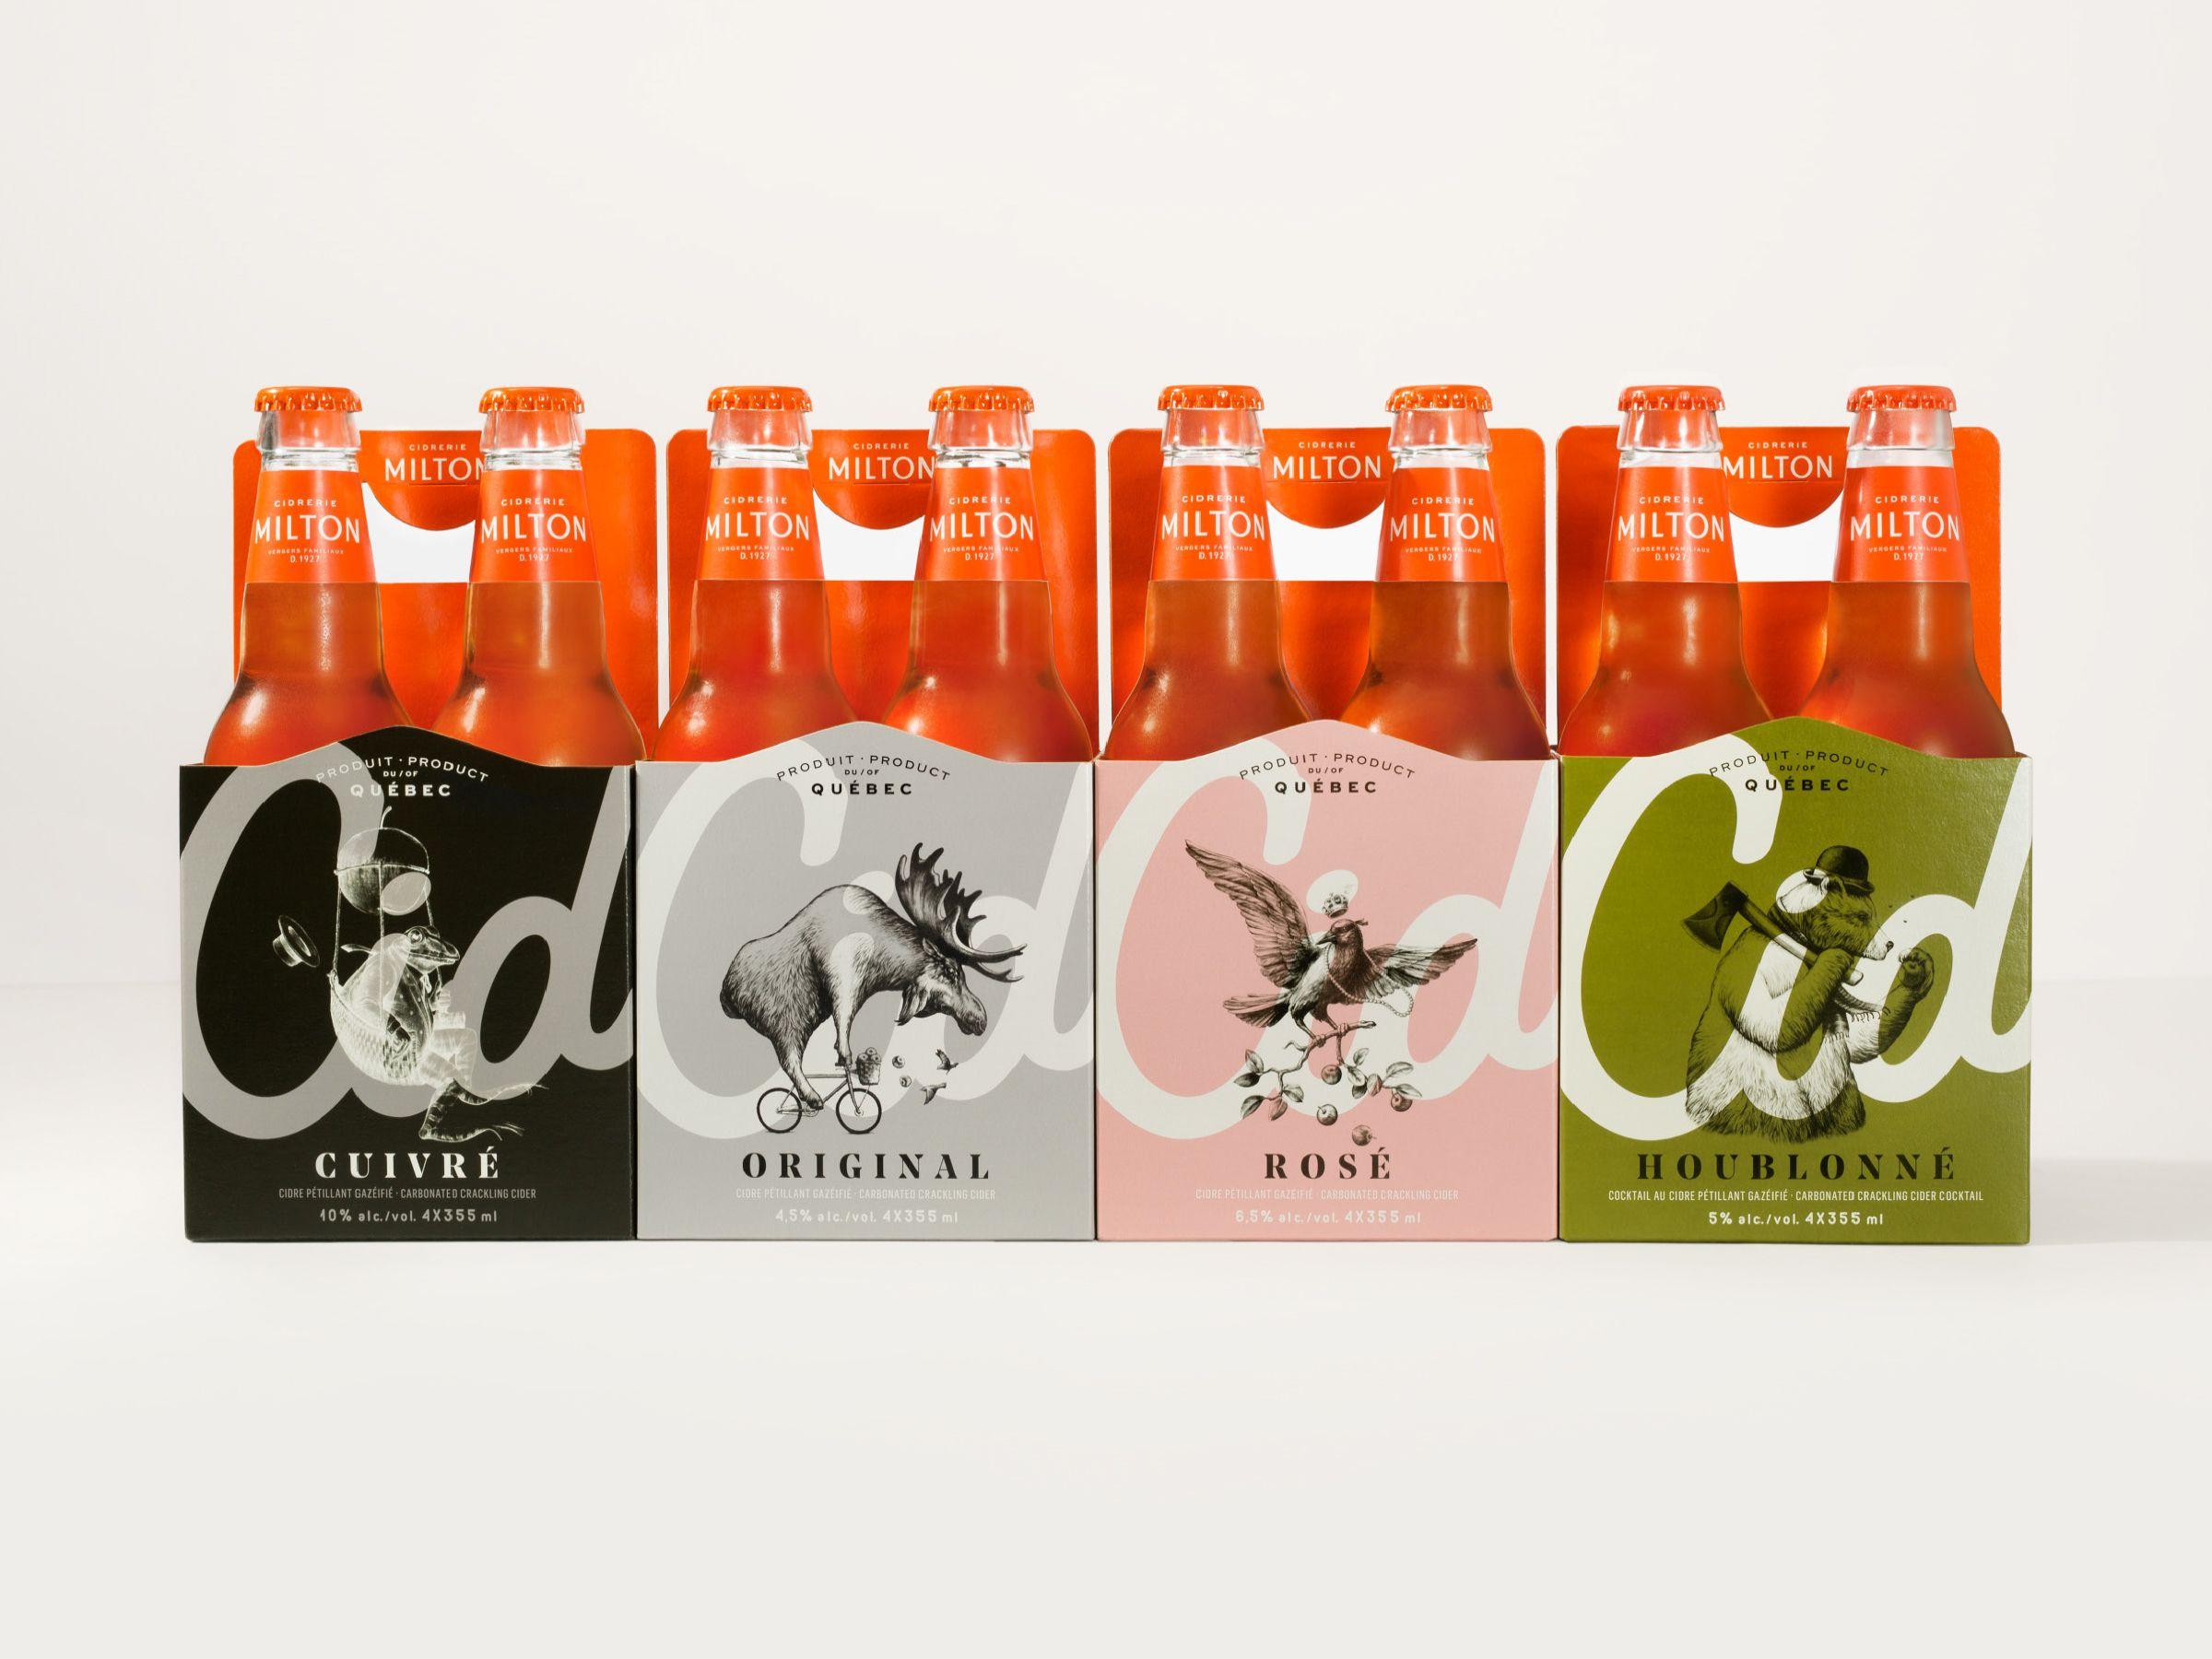 1 000 Unique Wine Labels More Booze Branding Innovations Eye On Design Brand Packaging Branding Design Packaging Spirits Packaging Design